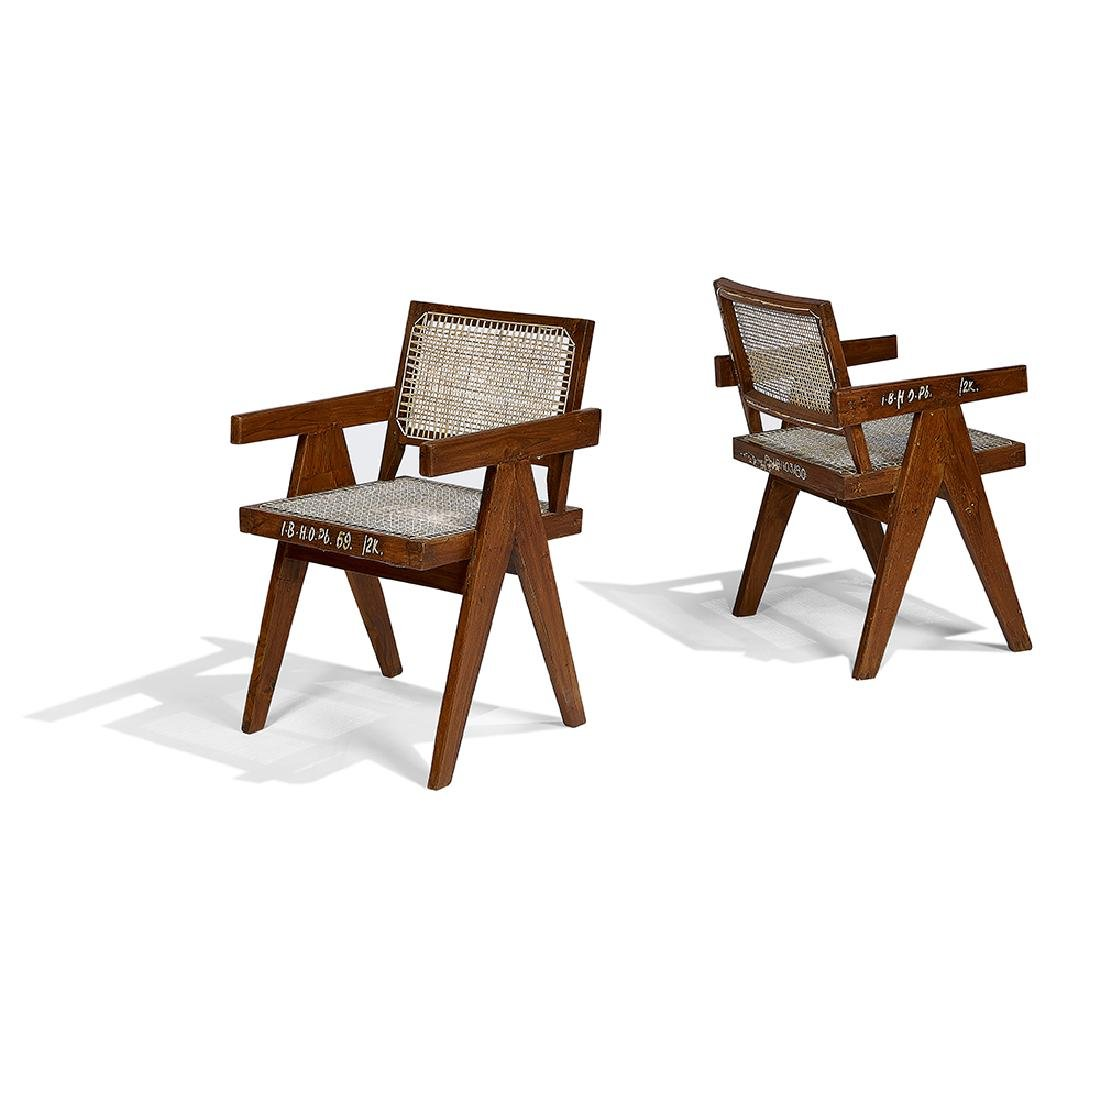 Pierre Jeanneret Armchairs, pair